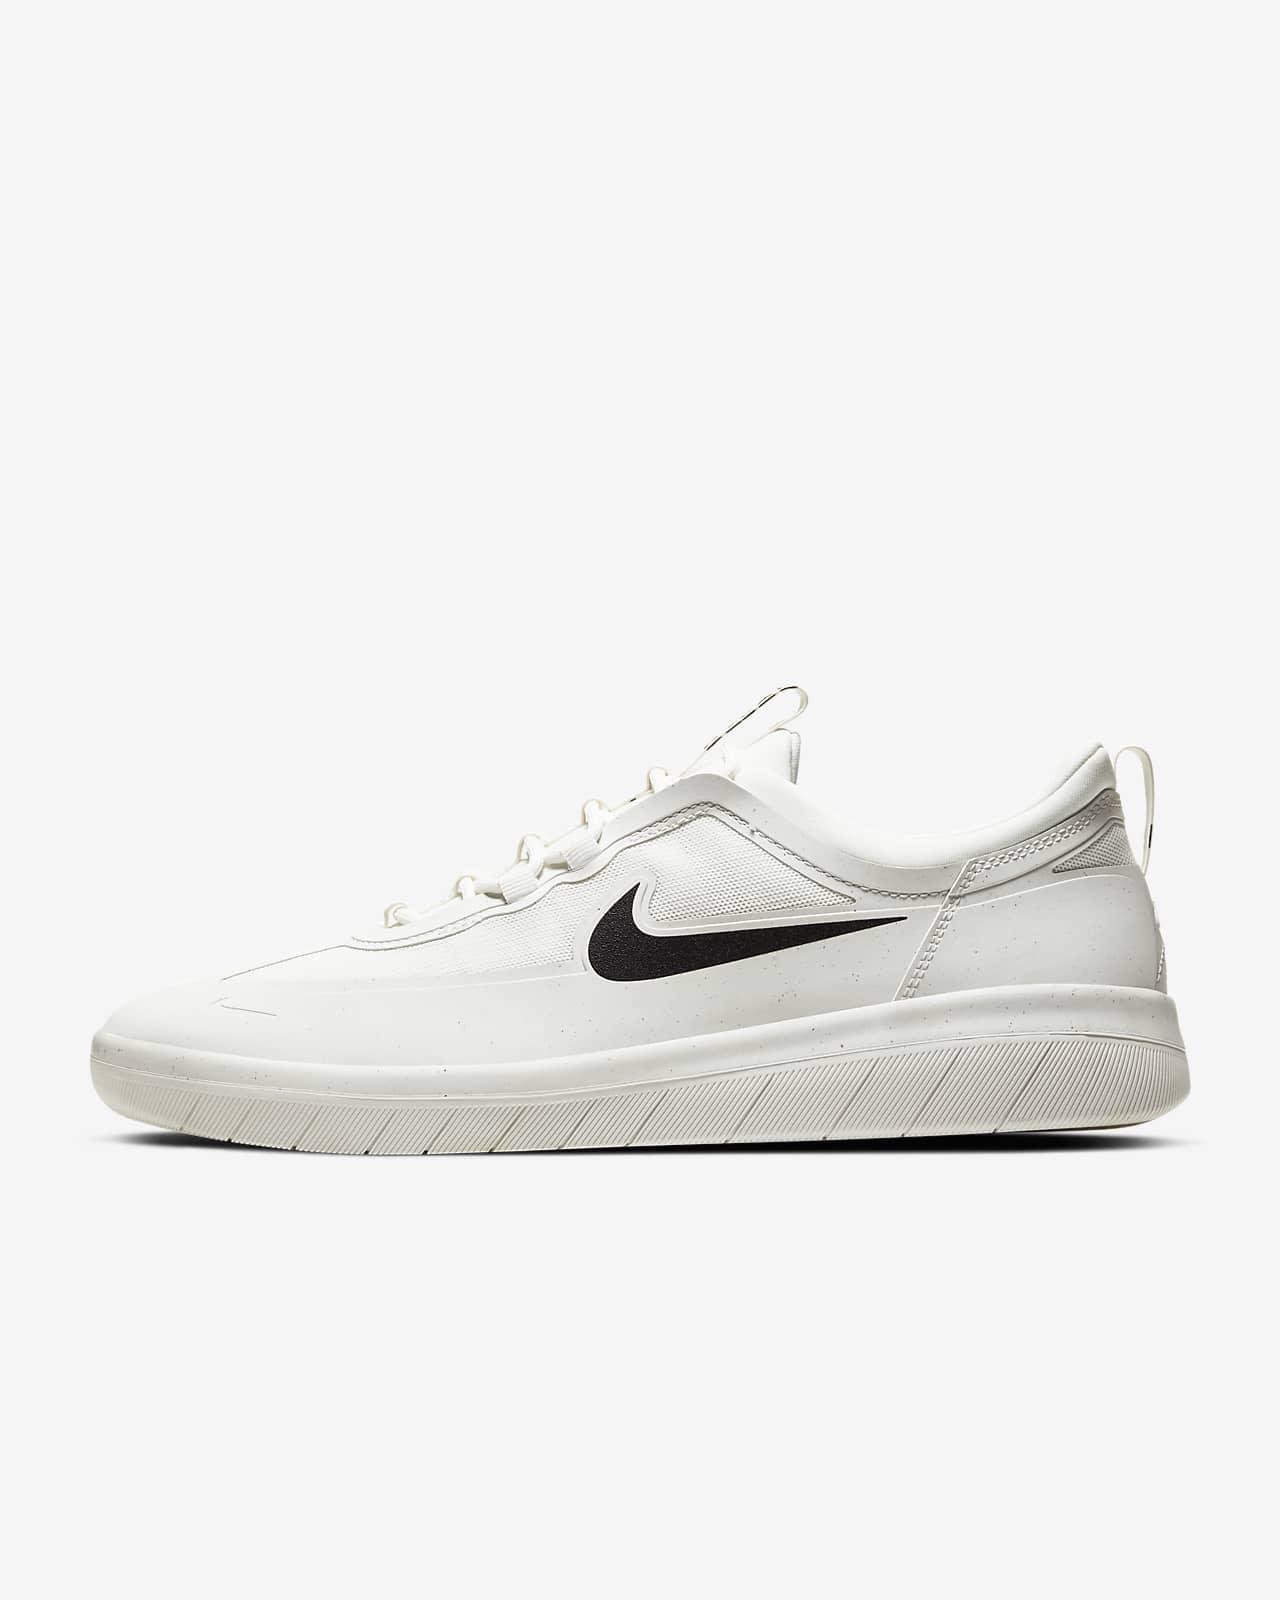 Calzado de skateboarding Nike SB Nyjah Free 2